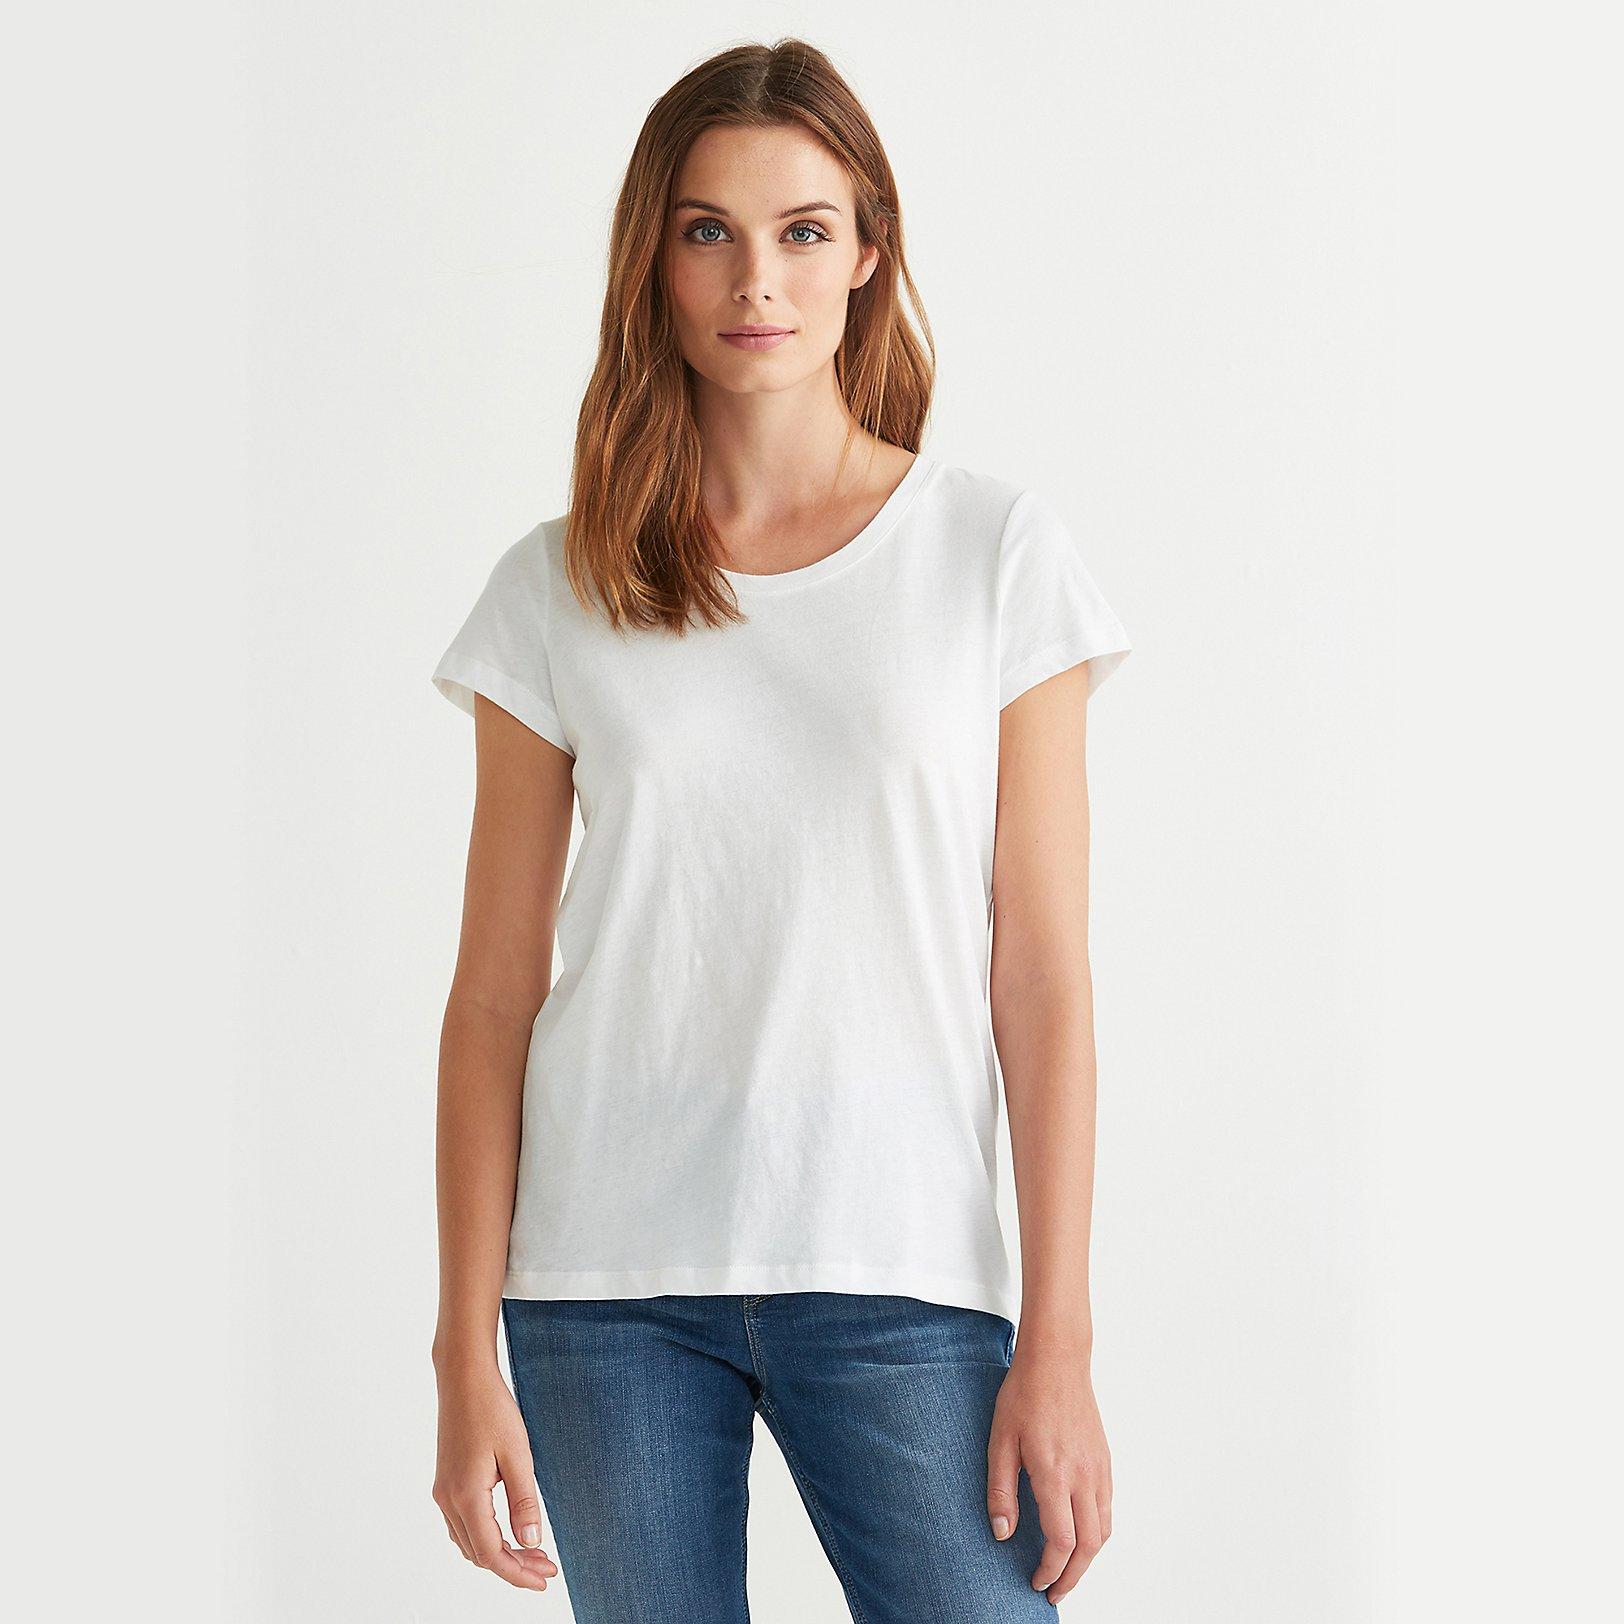 Design your t-shirt egypt - Egyptian Cotton T Shirt